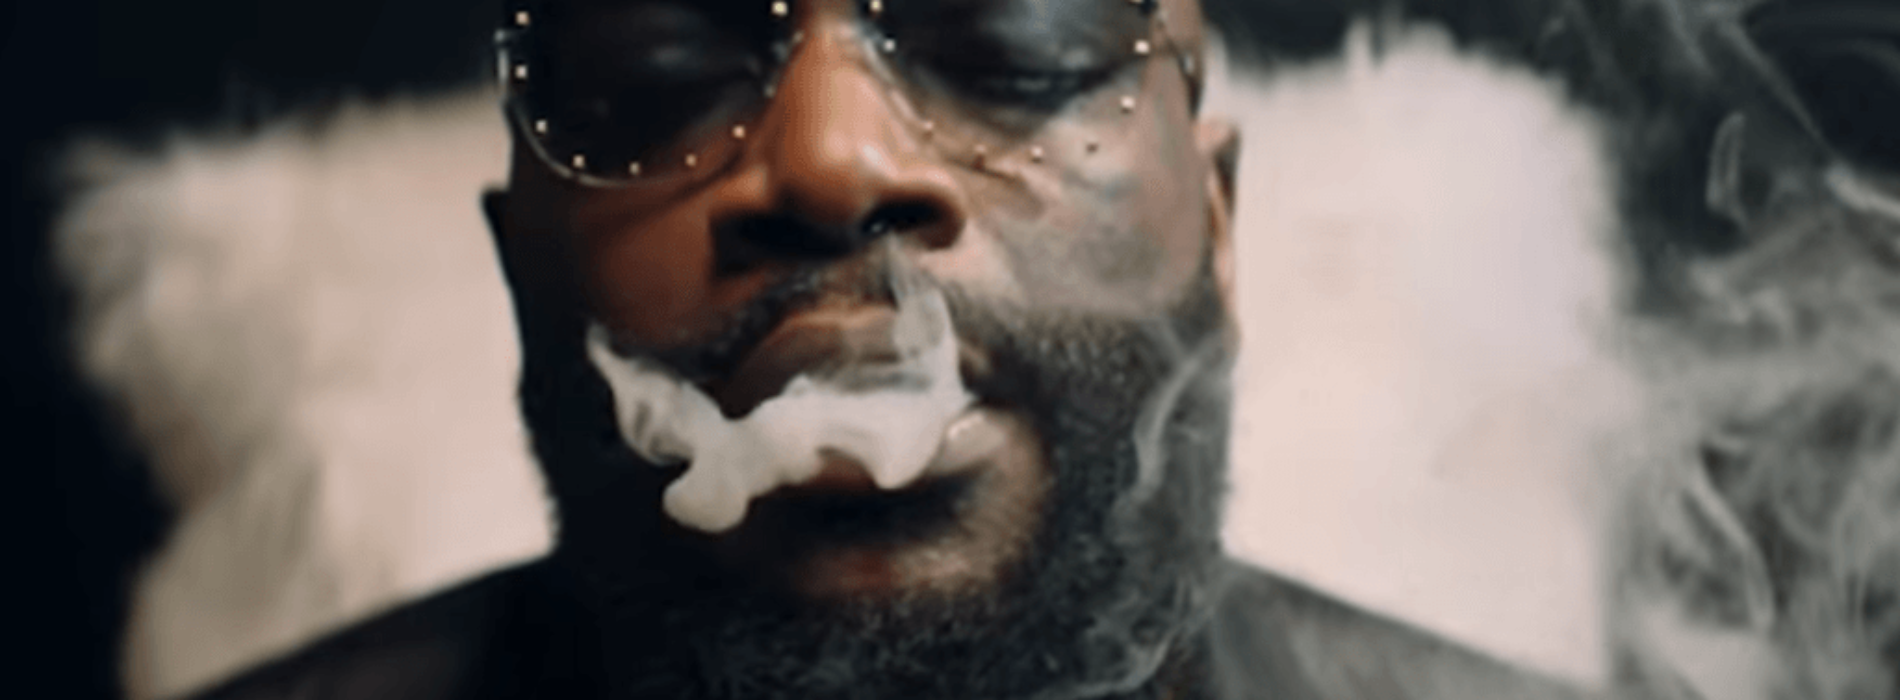 Godfather of Harlem – Just in Case ft. Swizz Beatz, Rick Ross, DMX – Octobre 2019